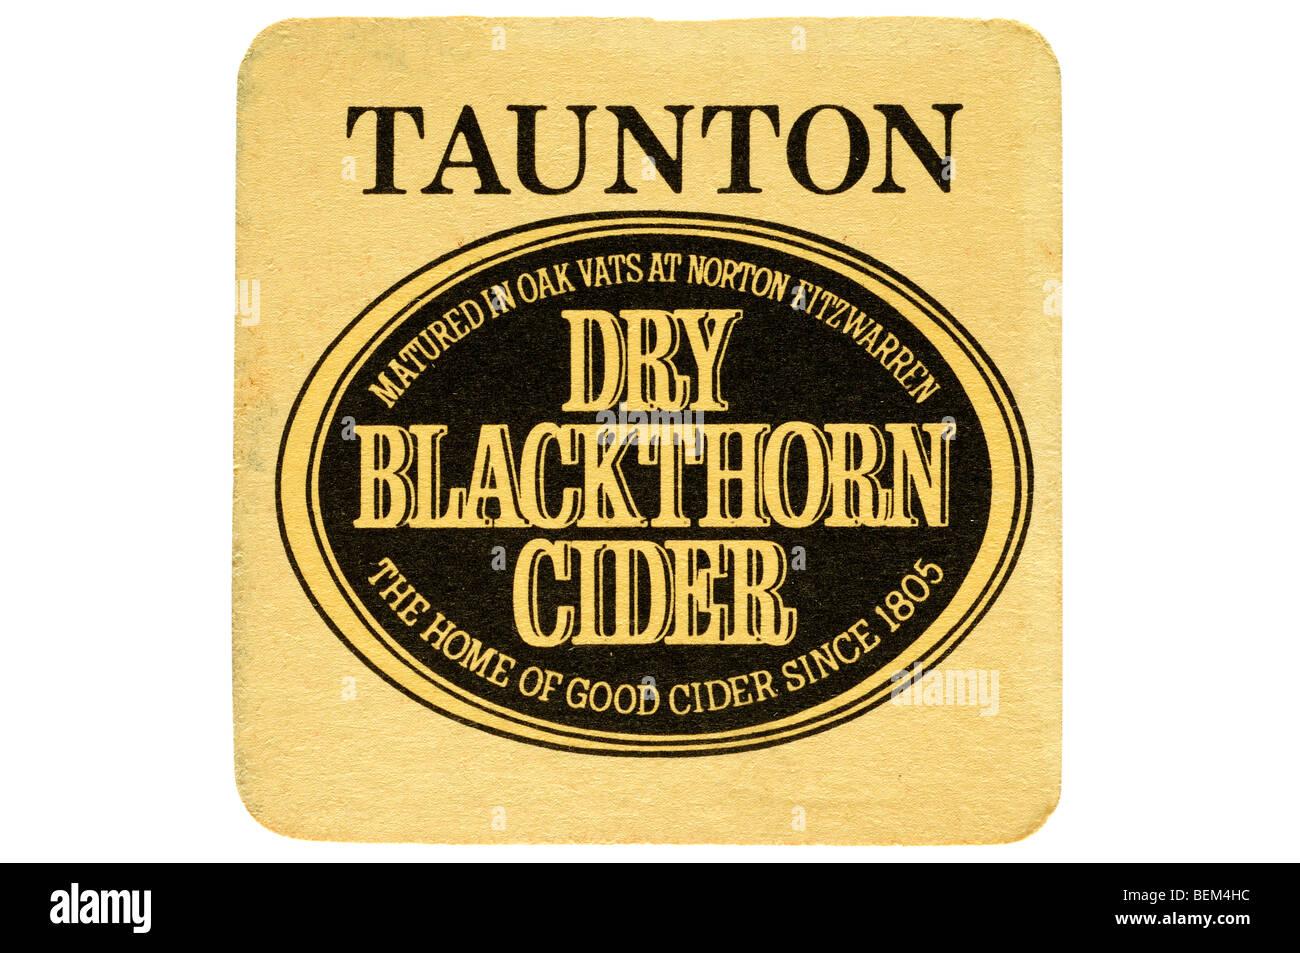 Taunton maduró en tinas de madera de roble en norton fitzwarren endrino sidra seca la casa de buena sidra desde Imagen De Stock